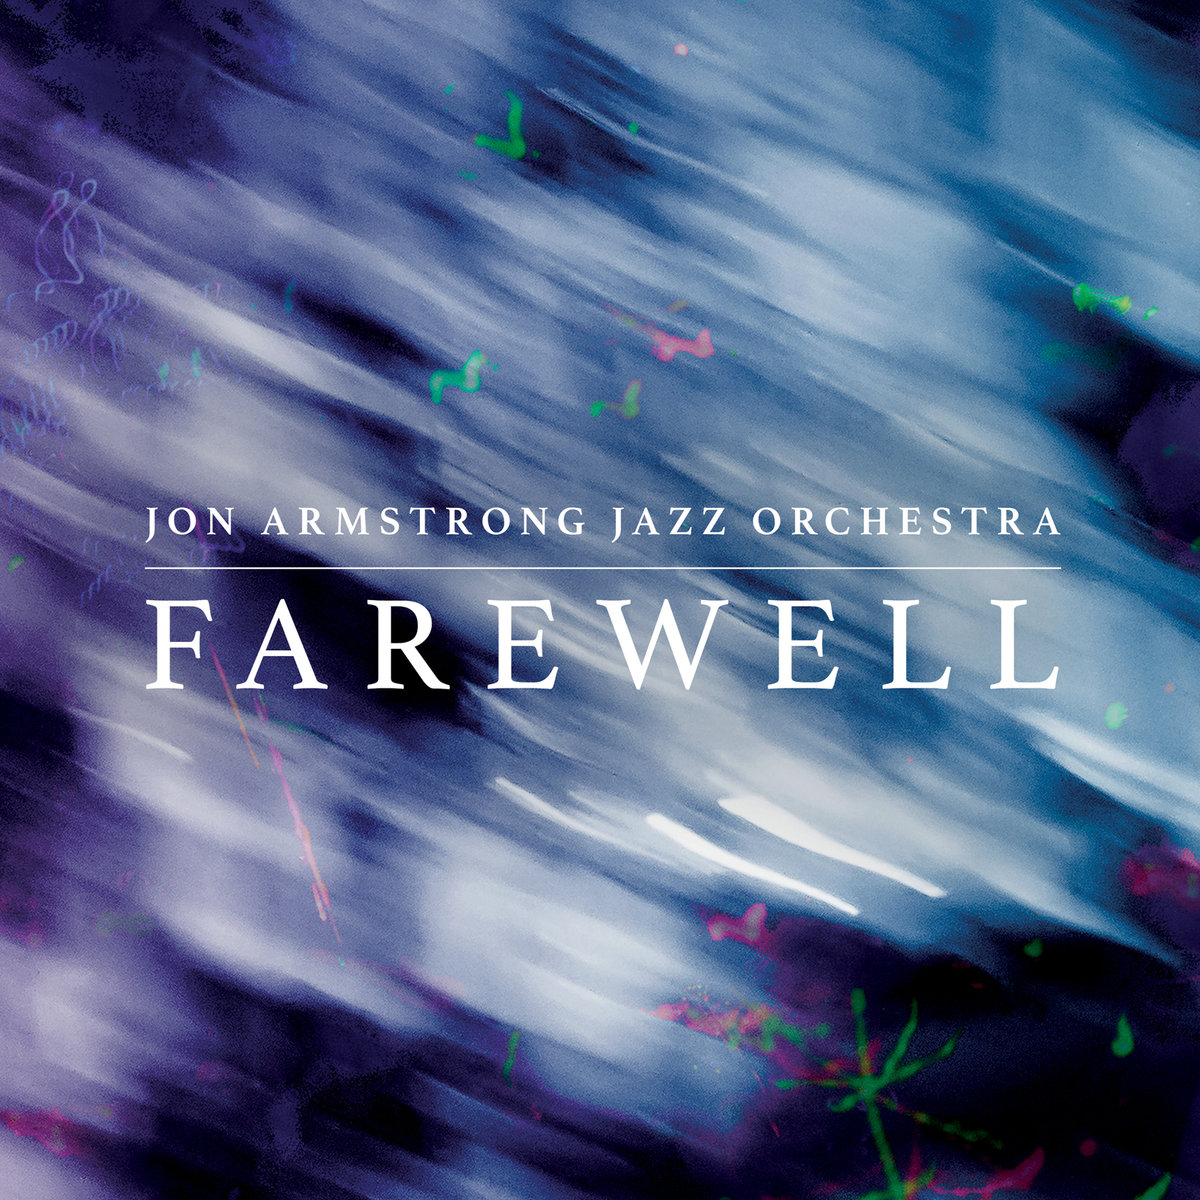 Jon Armstrong Jazz Orchestra | Farewell